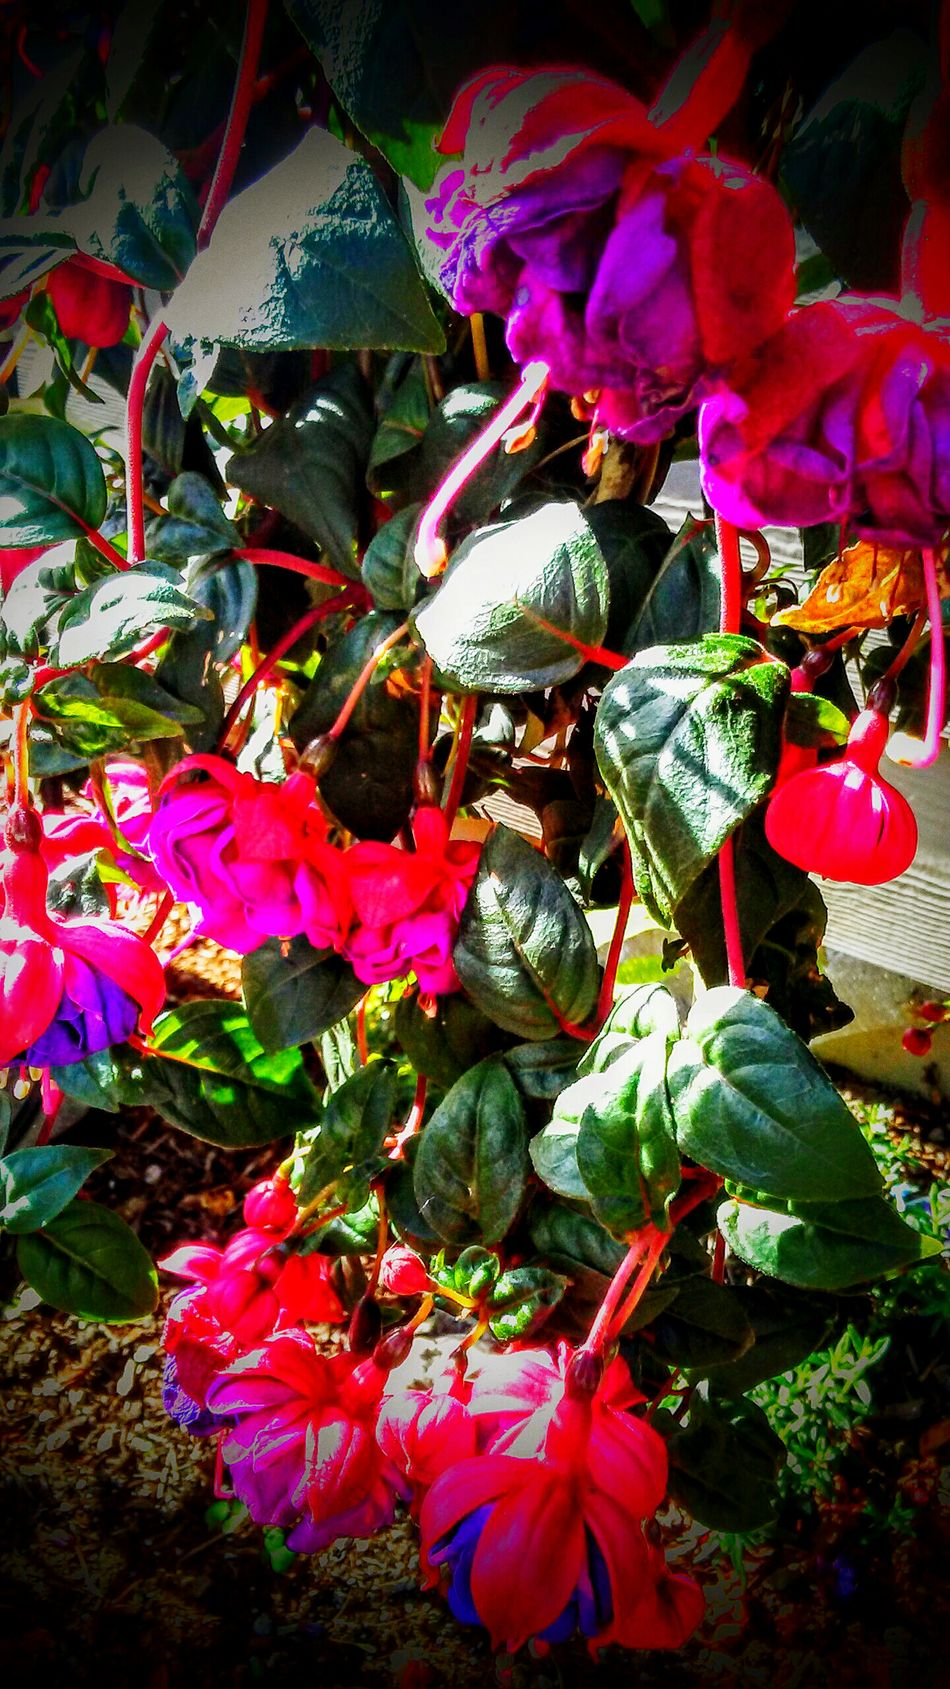 Vibrant Colorsplash Summer ☀ Labor Of Love Garden Photography Summer Blooms Botanical Gardens